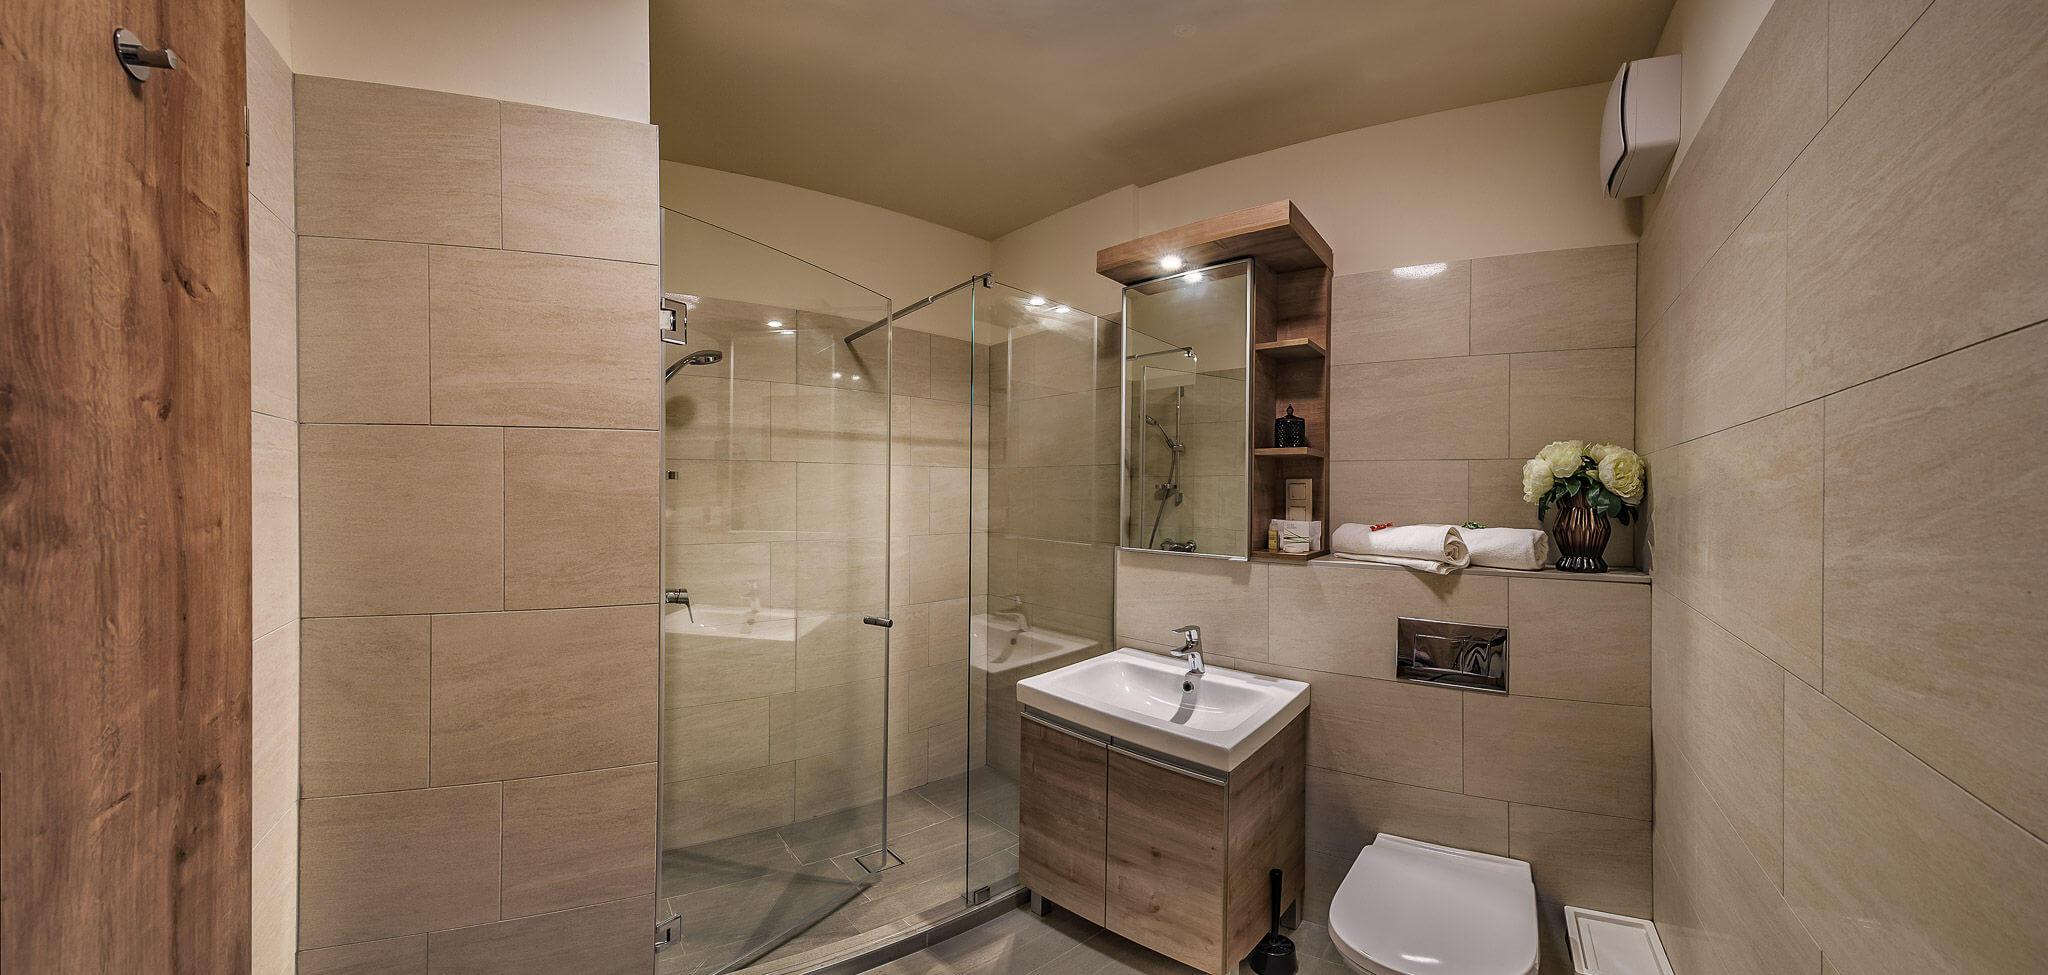 One bedroom Standard 1 - Art Homes Budapest